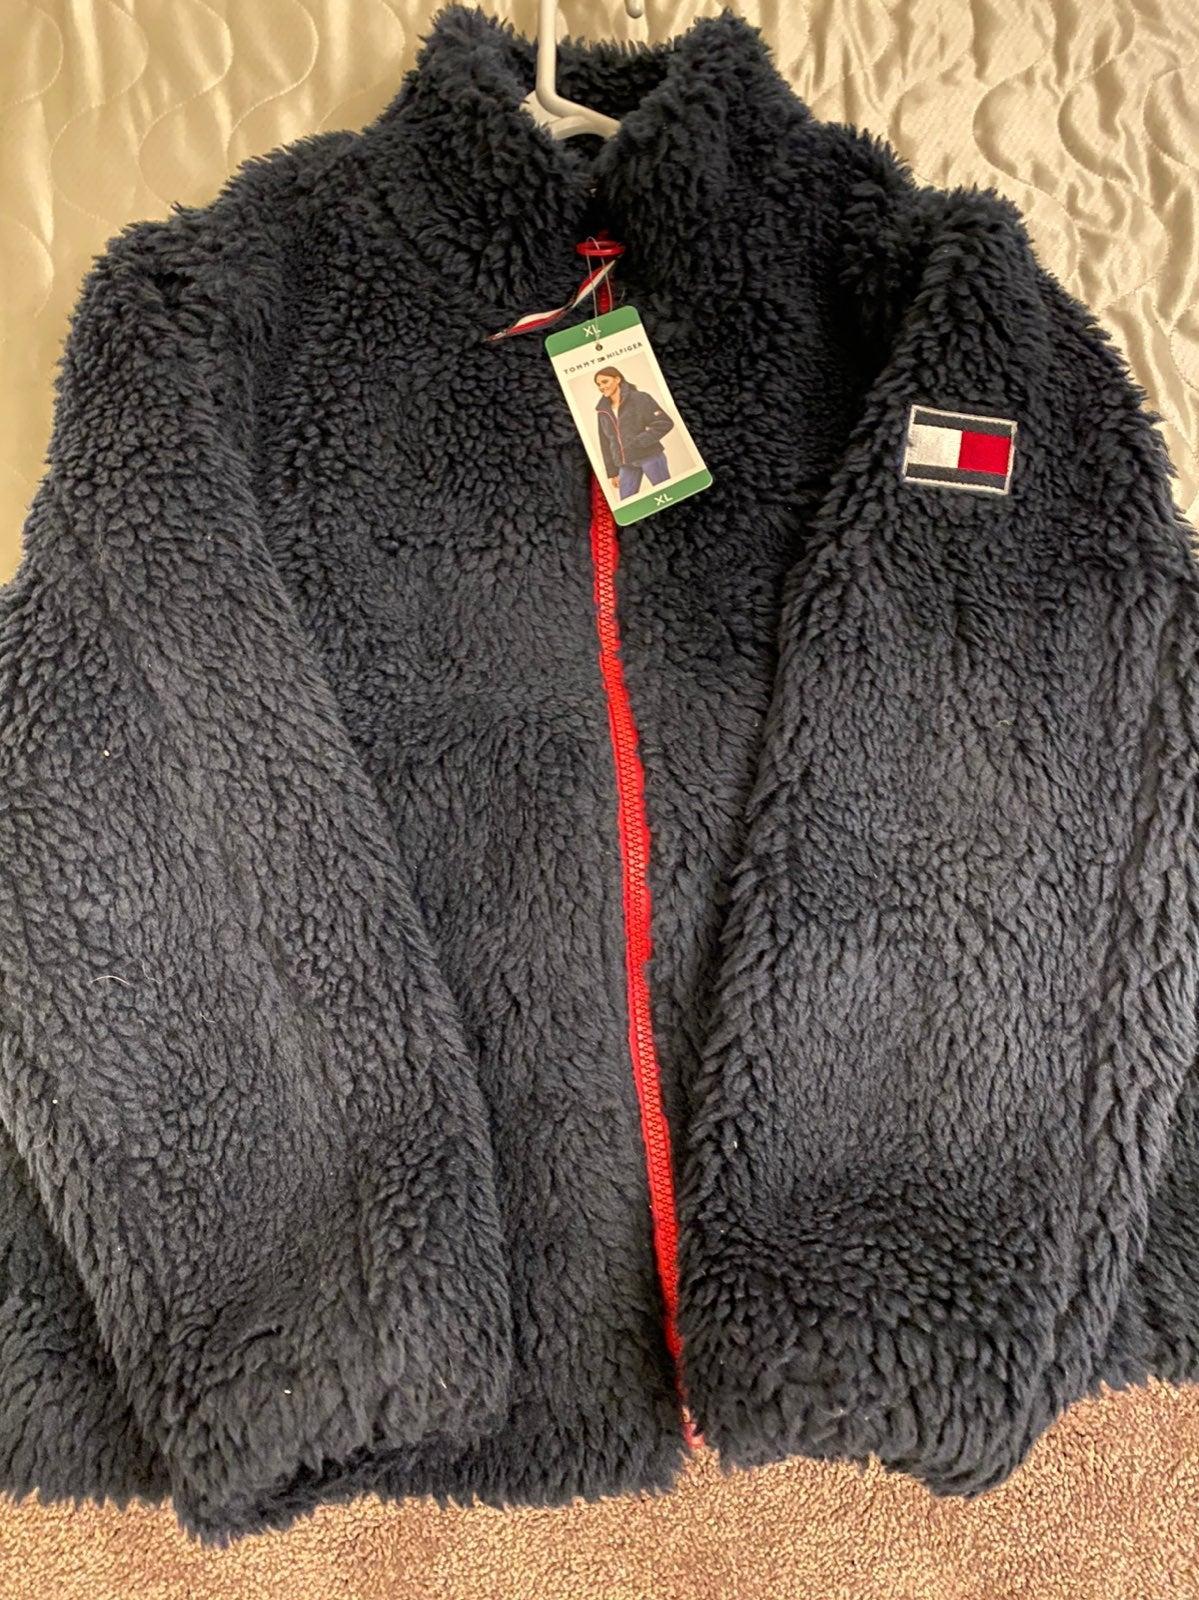 Fluffy Tommy Hilfiger jacket